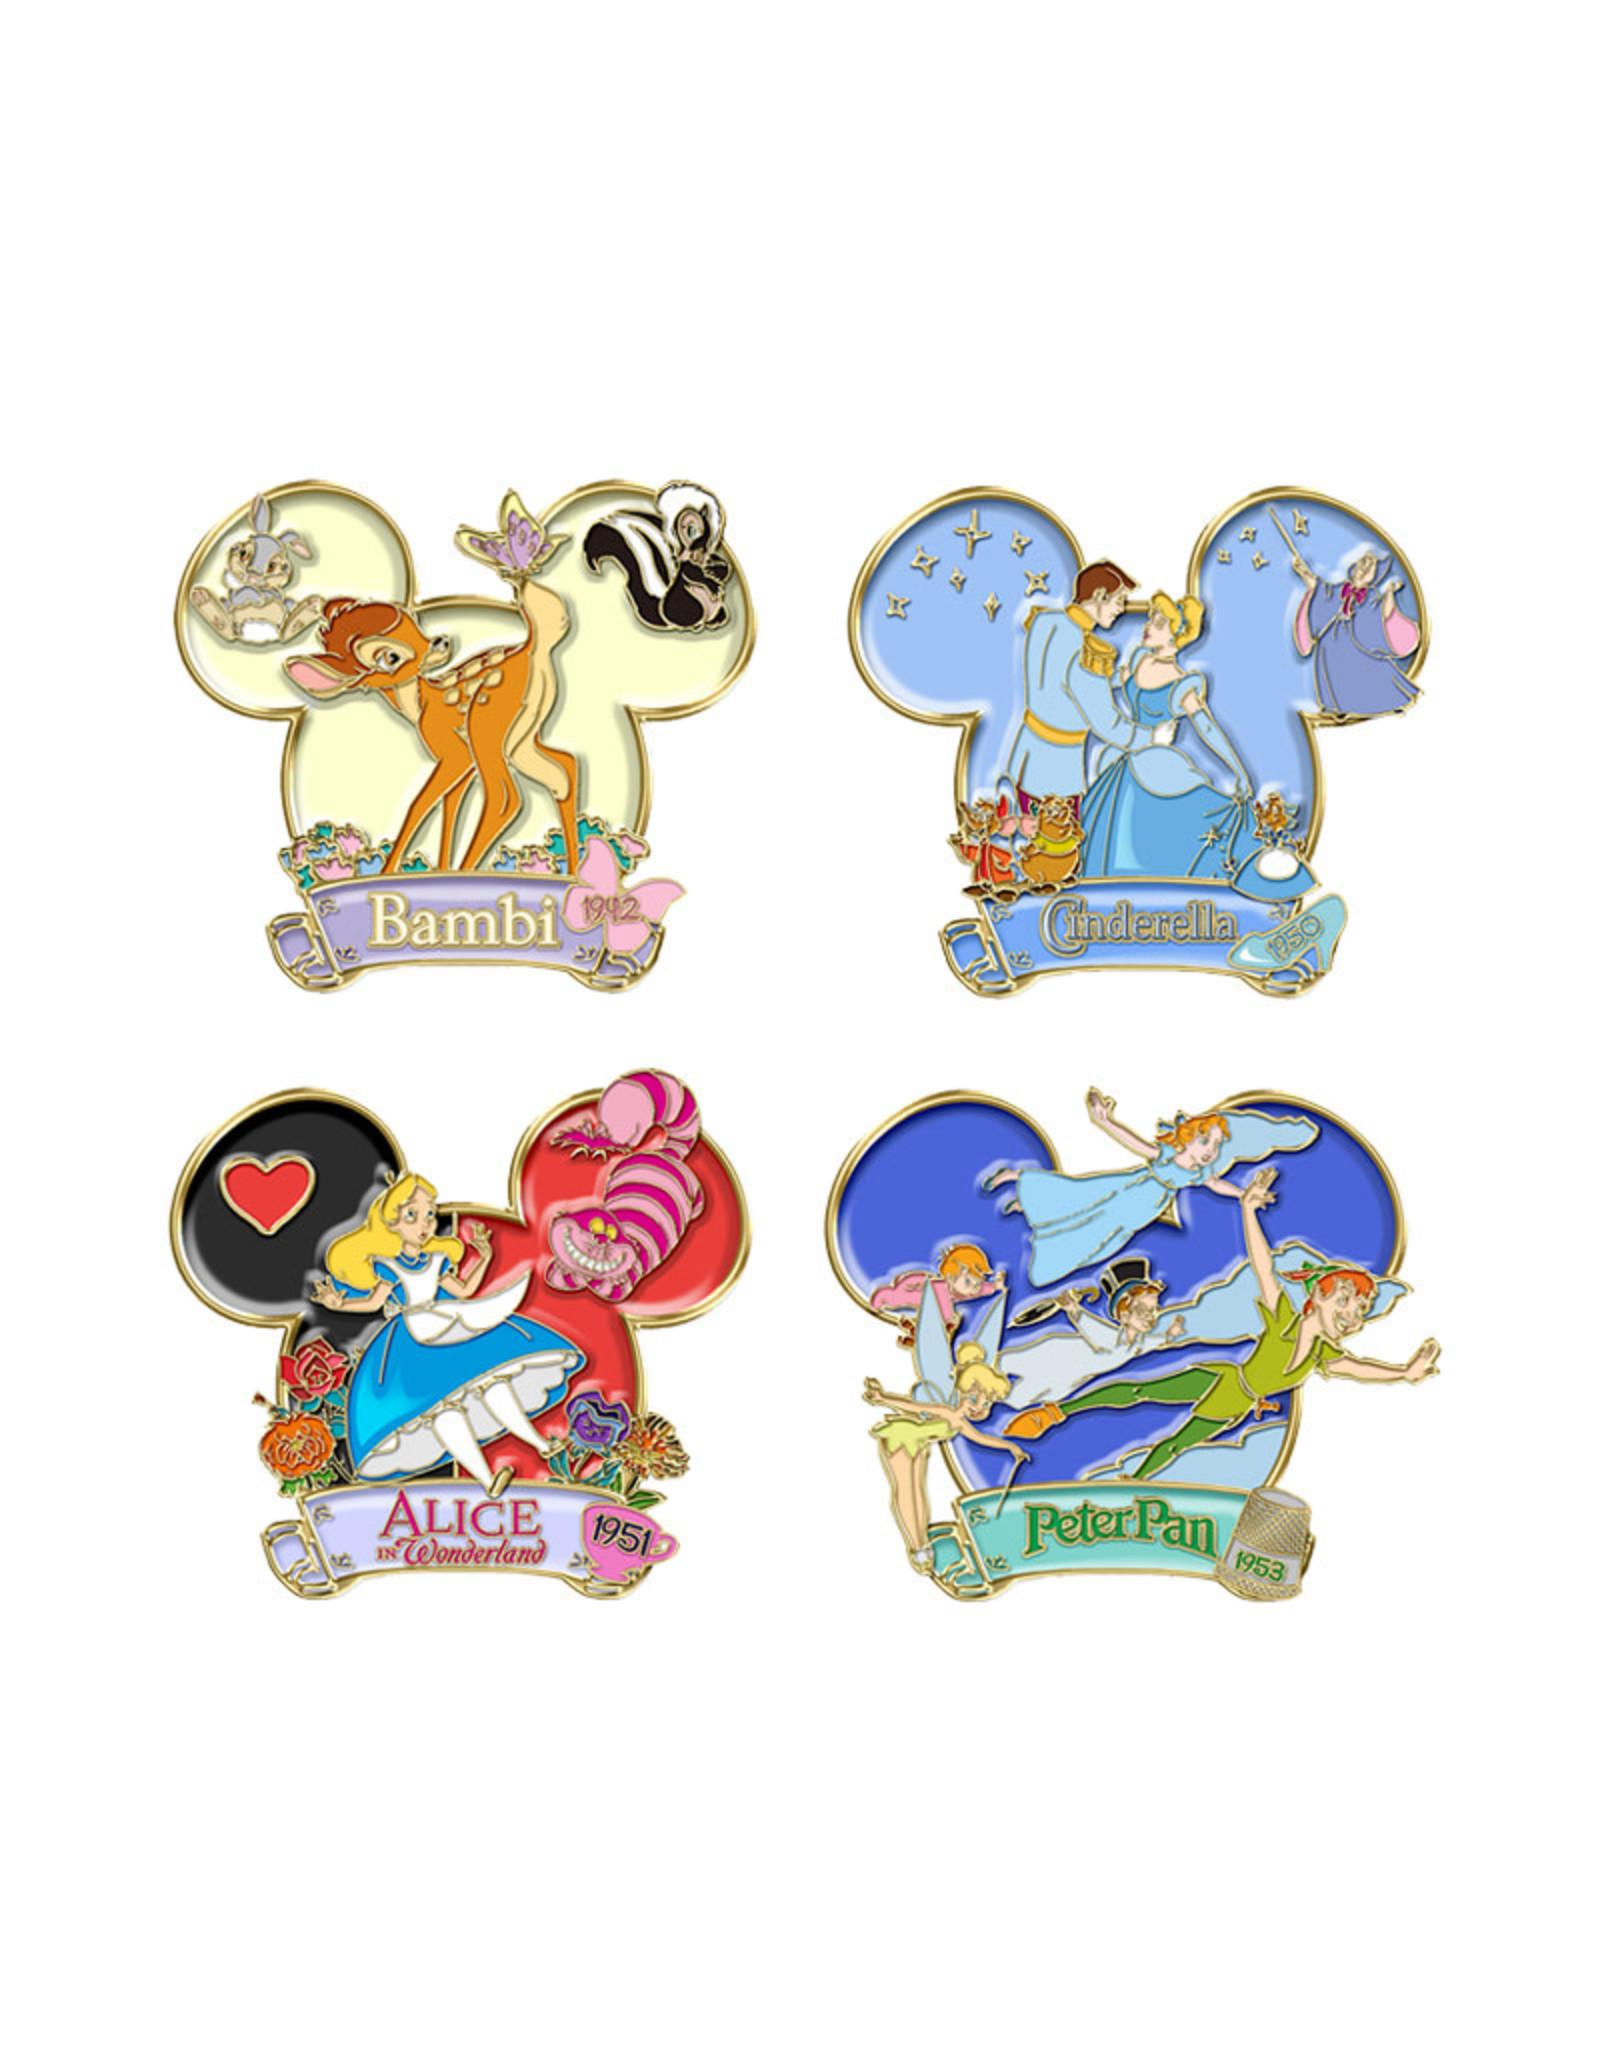 Disney Disney ( Collectable Enamel Pins Set )